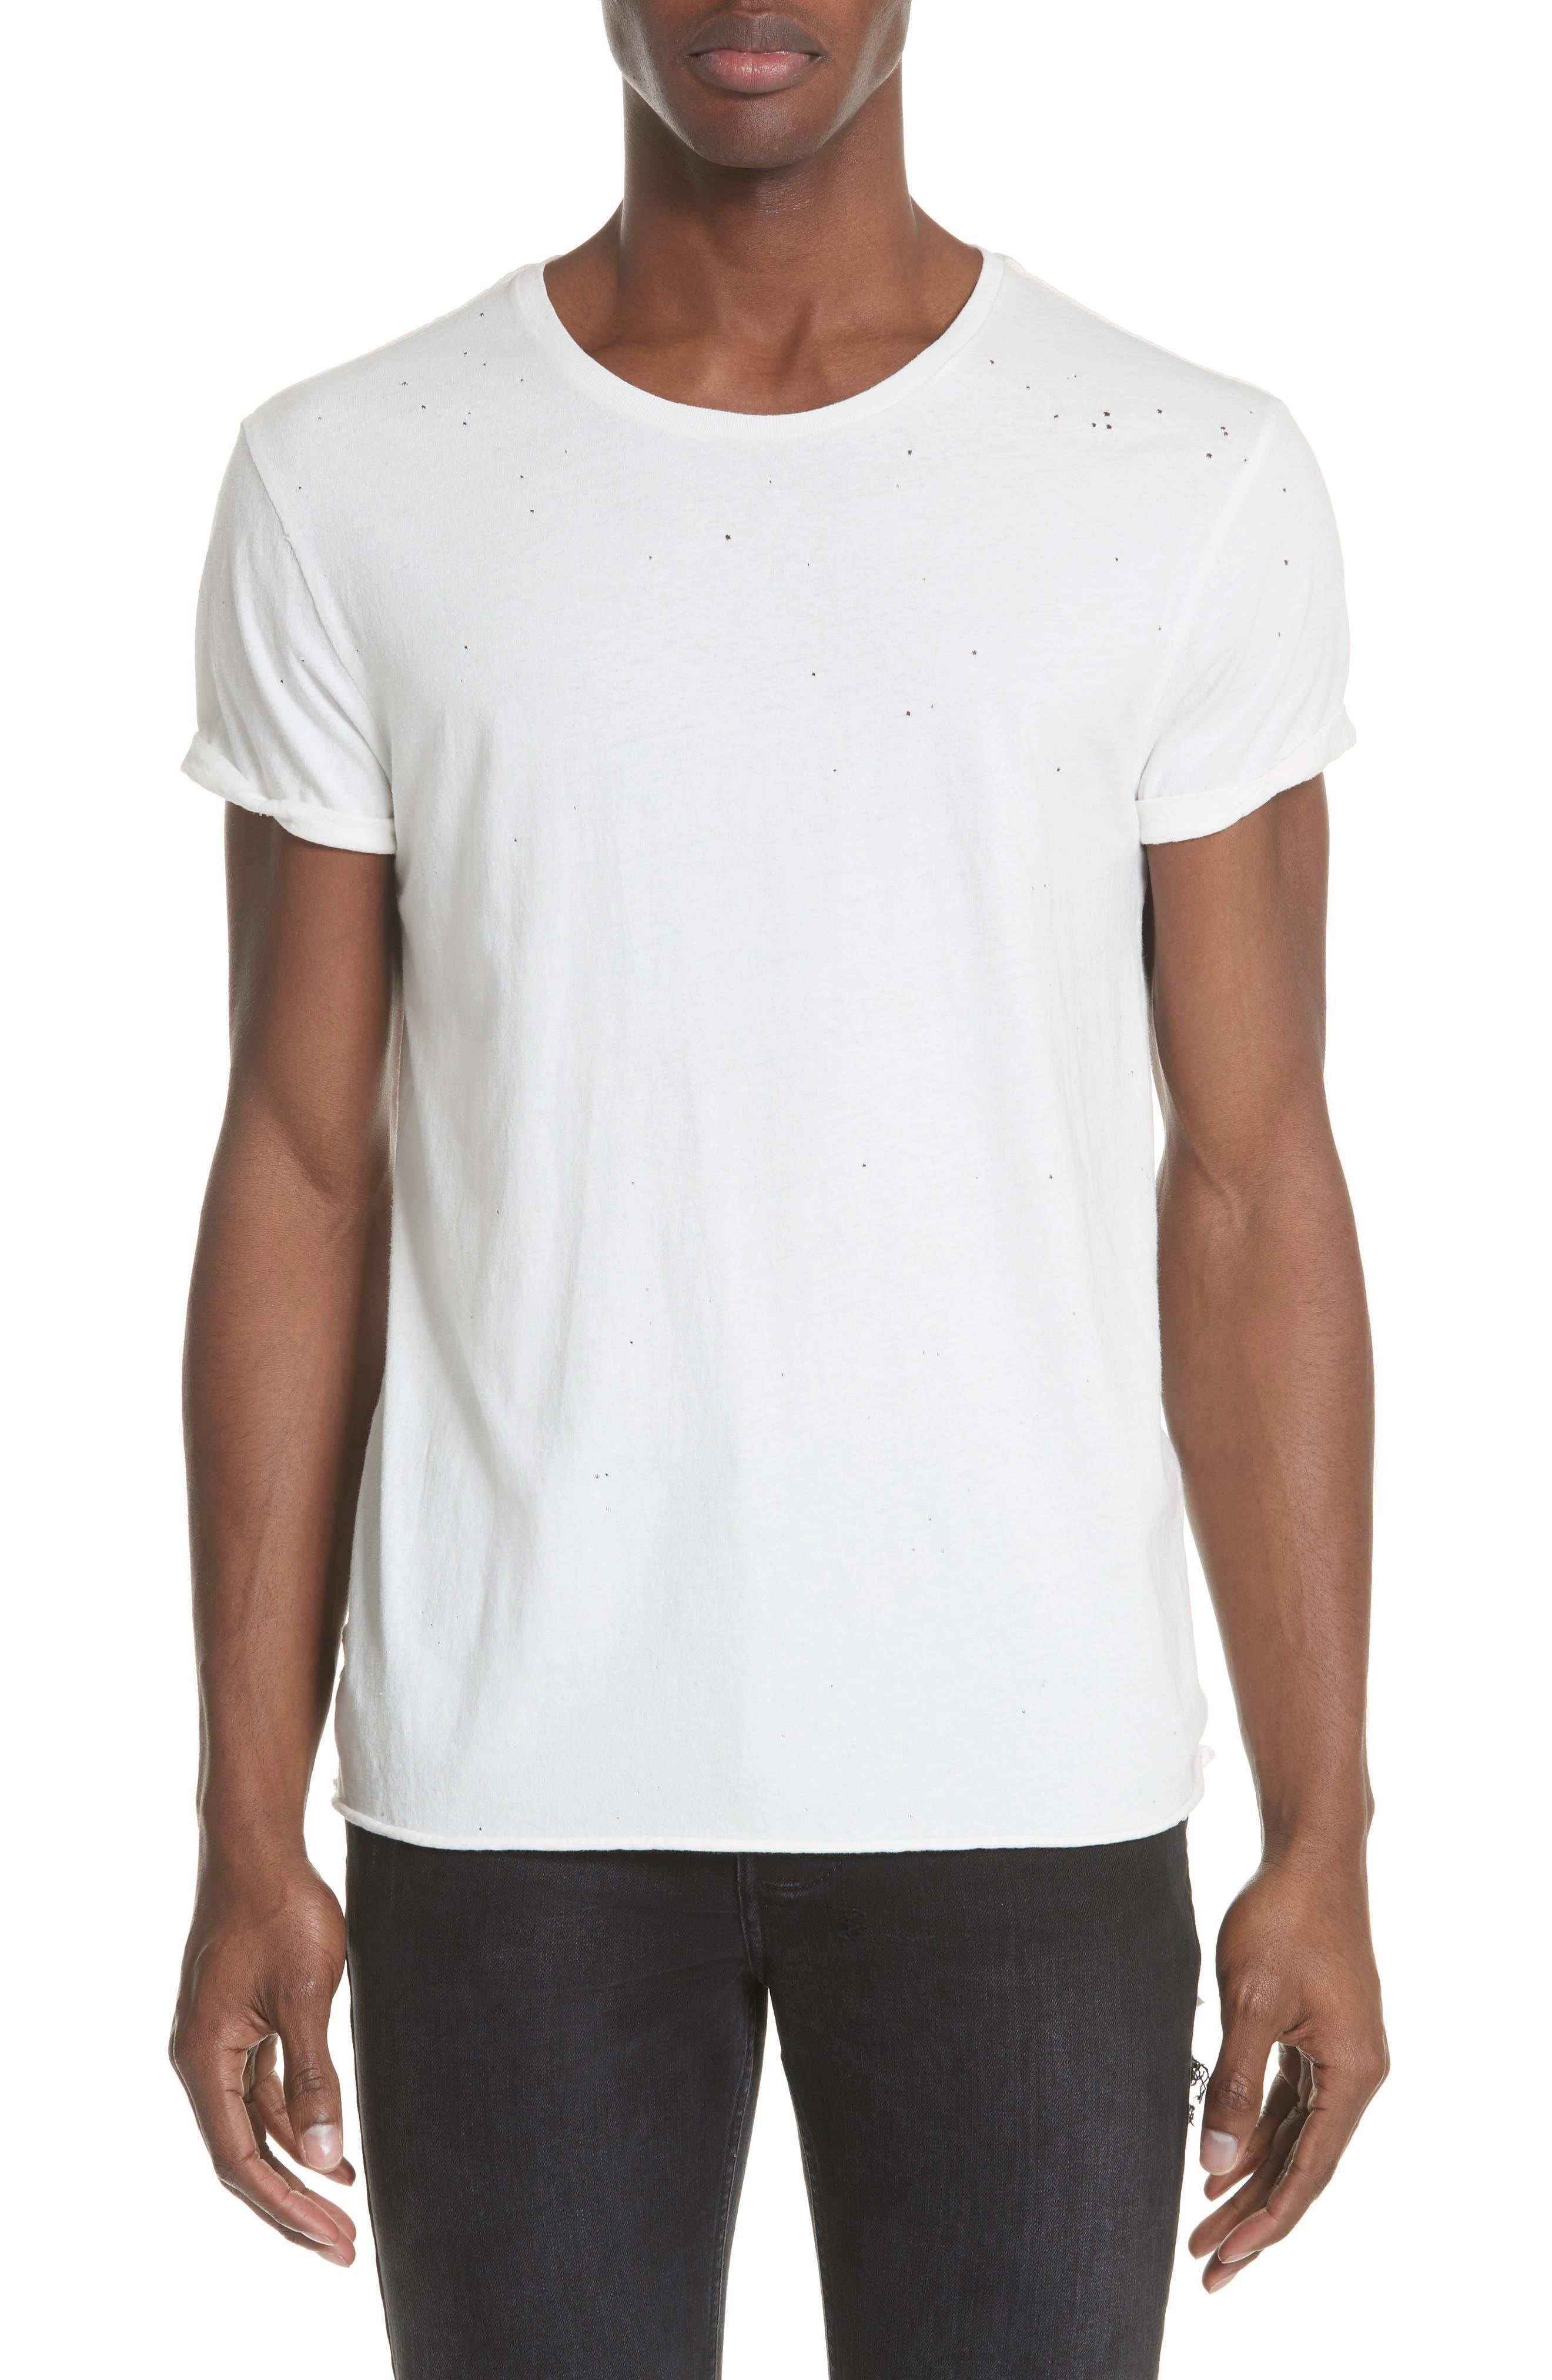 Kodeine Crewneck T-Shirt,                             Main thumbnail 1, color,                             WHITE